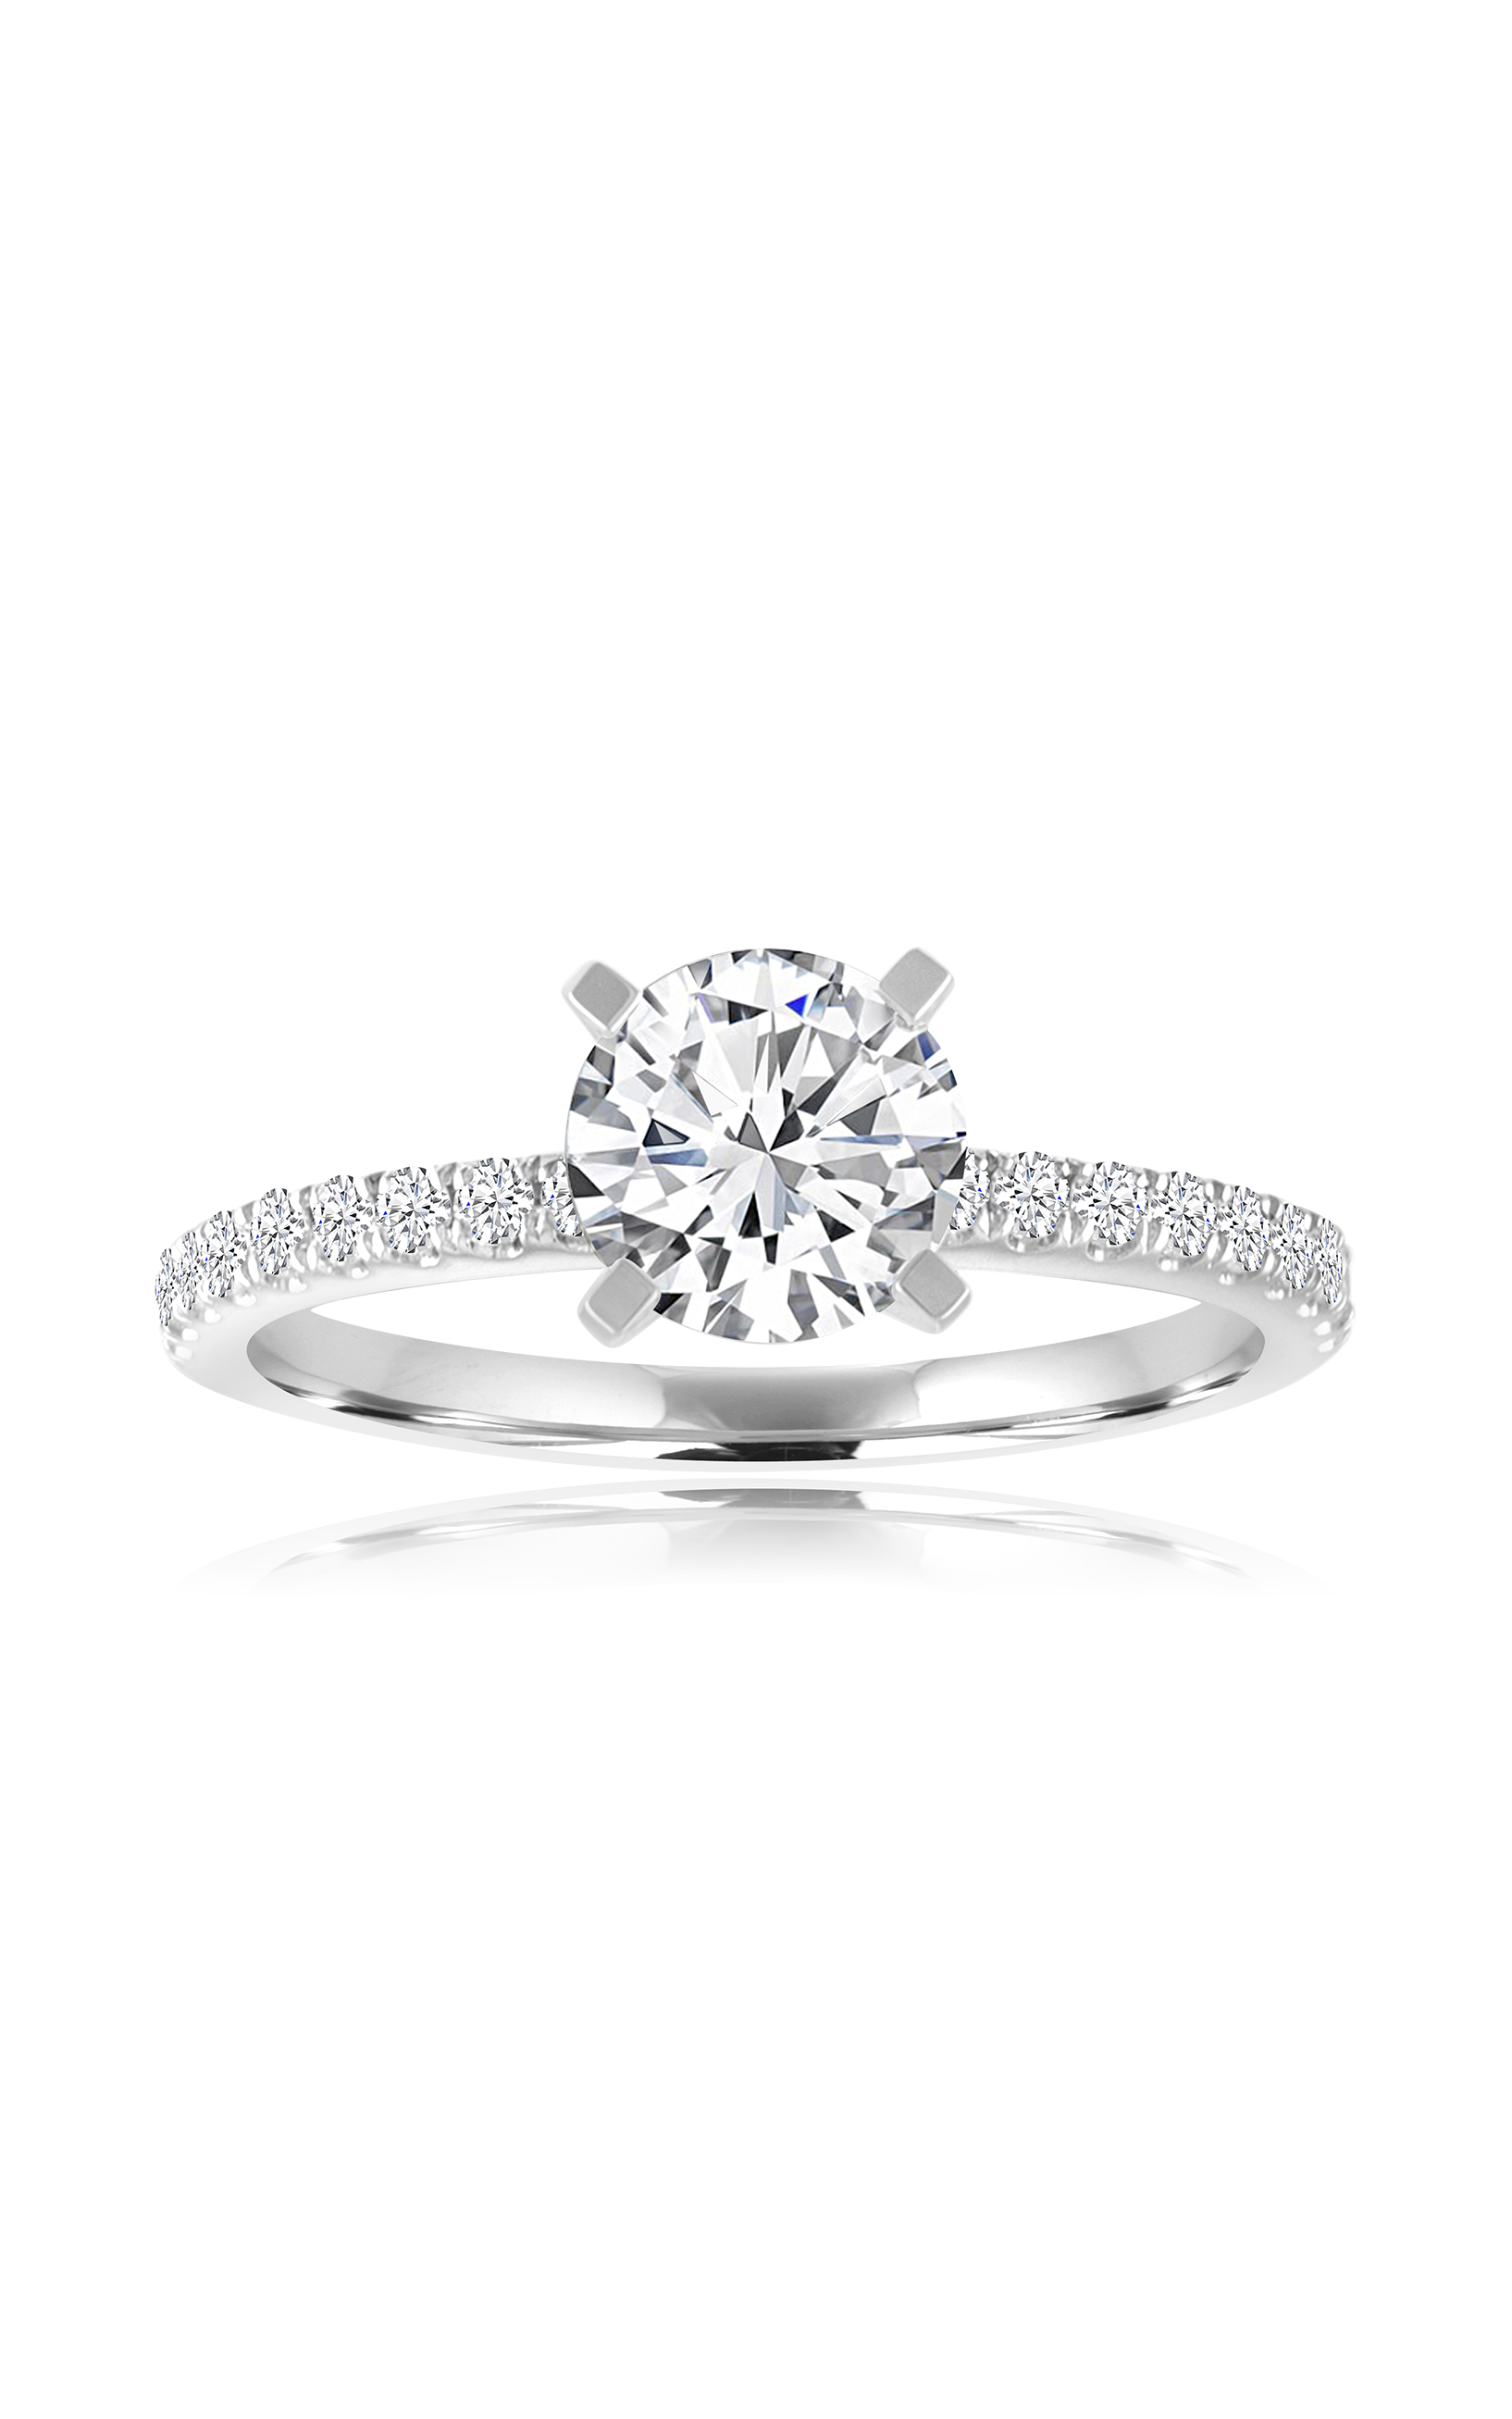 Imagine Bridal Engagement Rings 66156D-1 product image